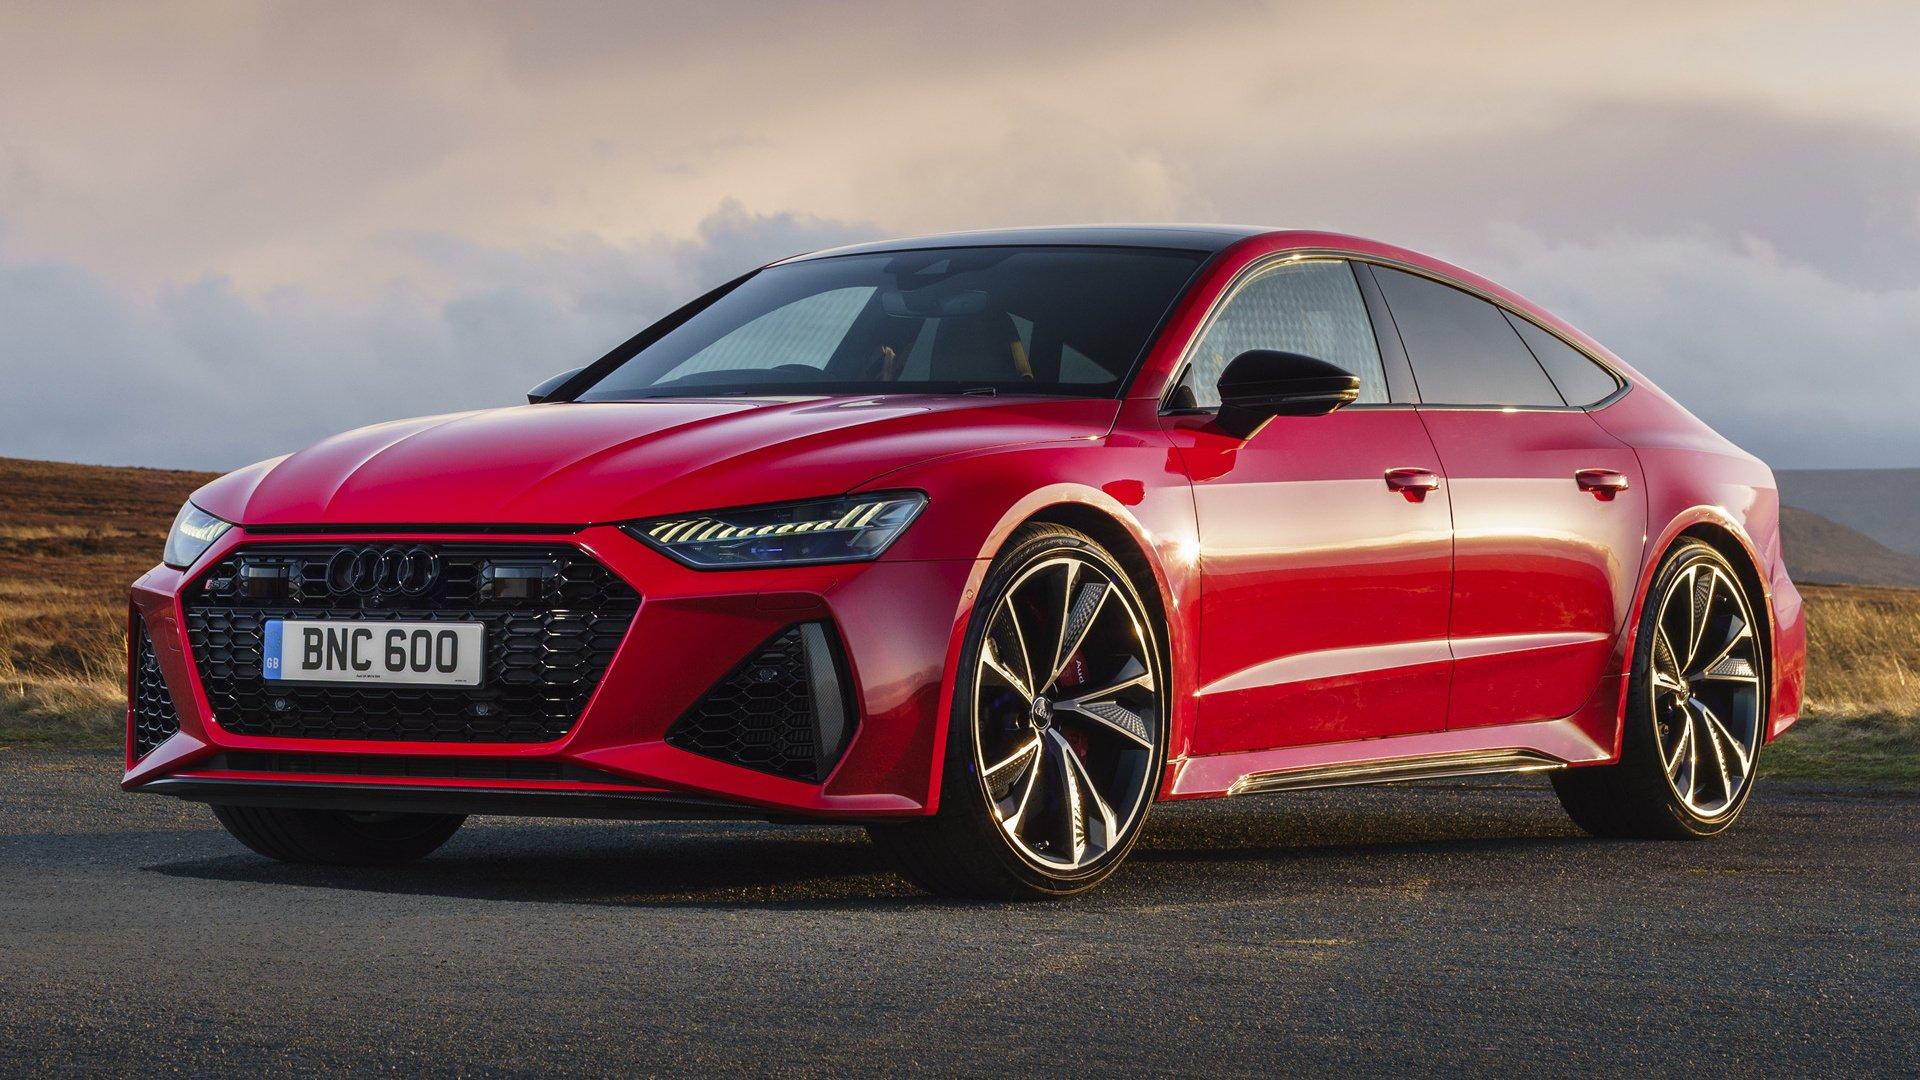 2020 Audi Rs7 Sportback Fond D Ecran Hd Arriere Plan 1920x1080 Id 1070844 Wallpaper Abyss